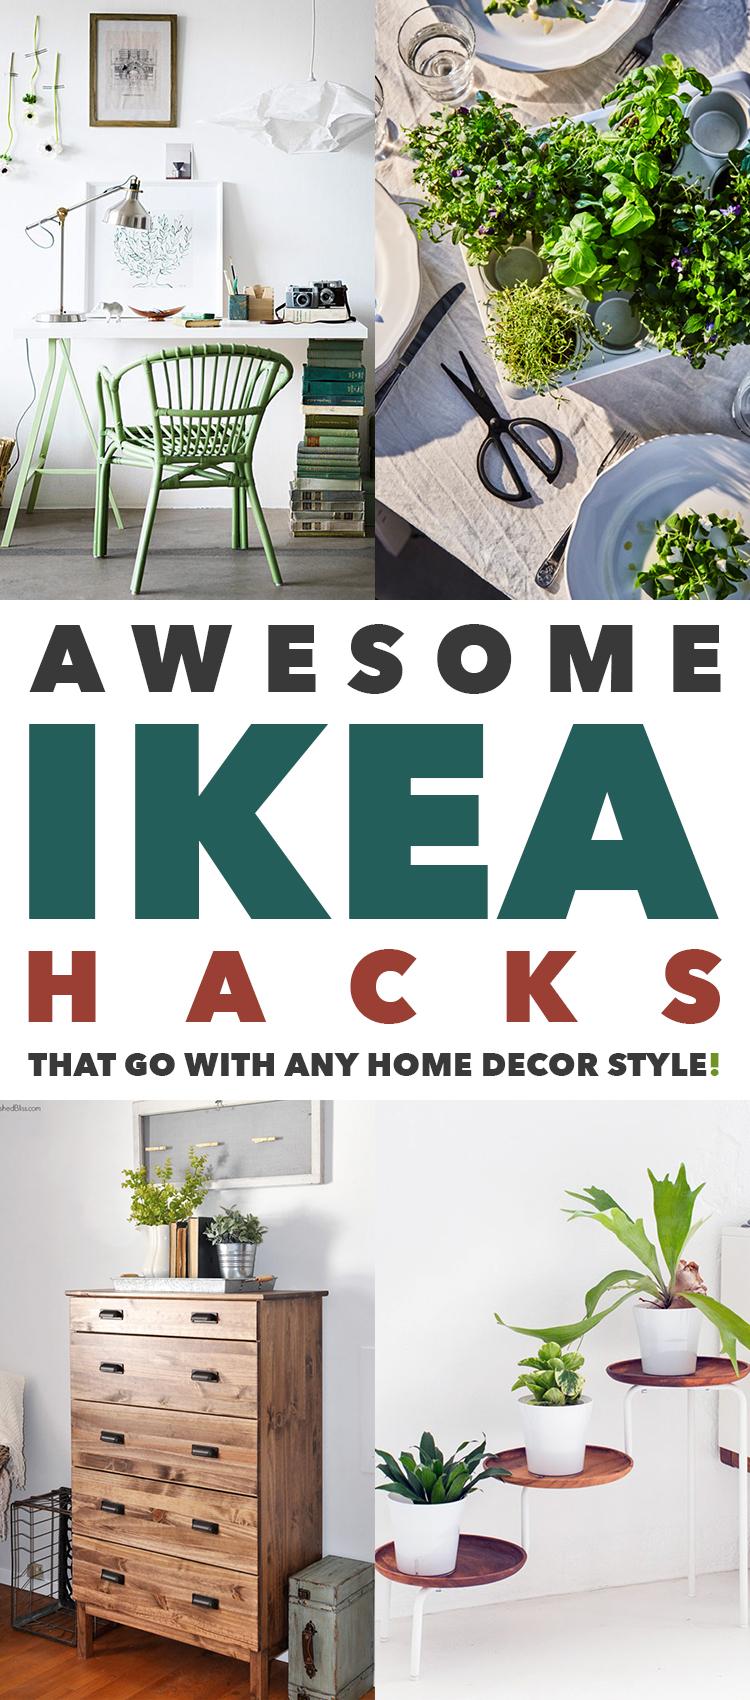 http://thecottagemarket.com/wp-content/uploads/2018/01/IKEA-T-1.jpg